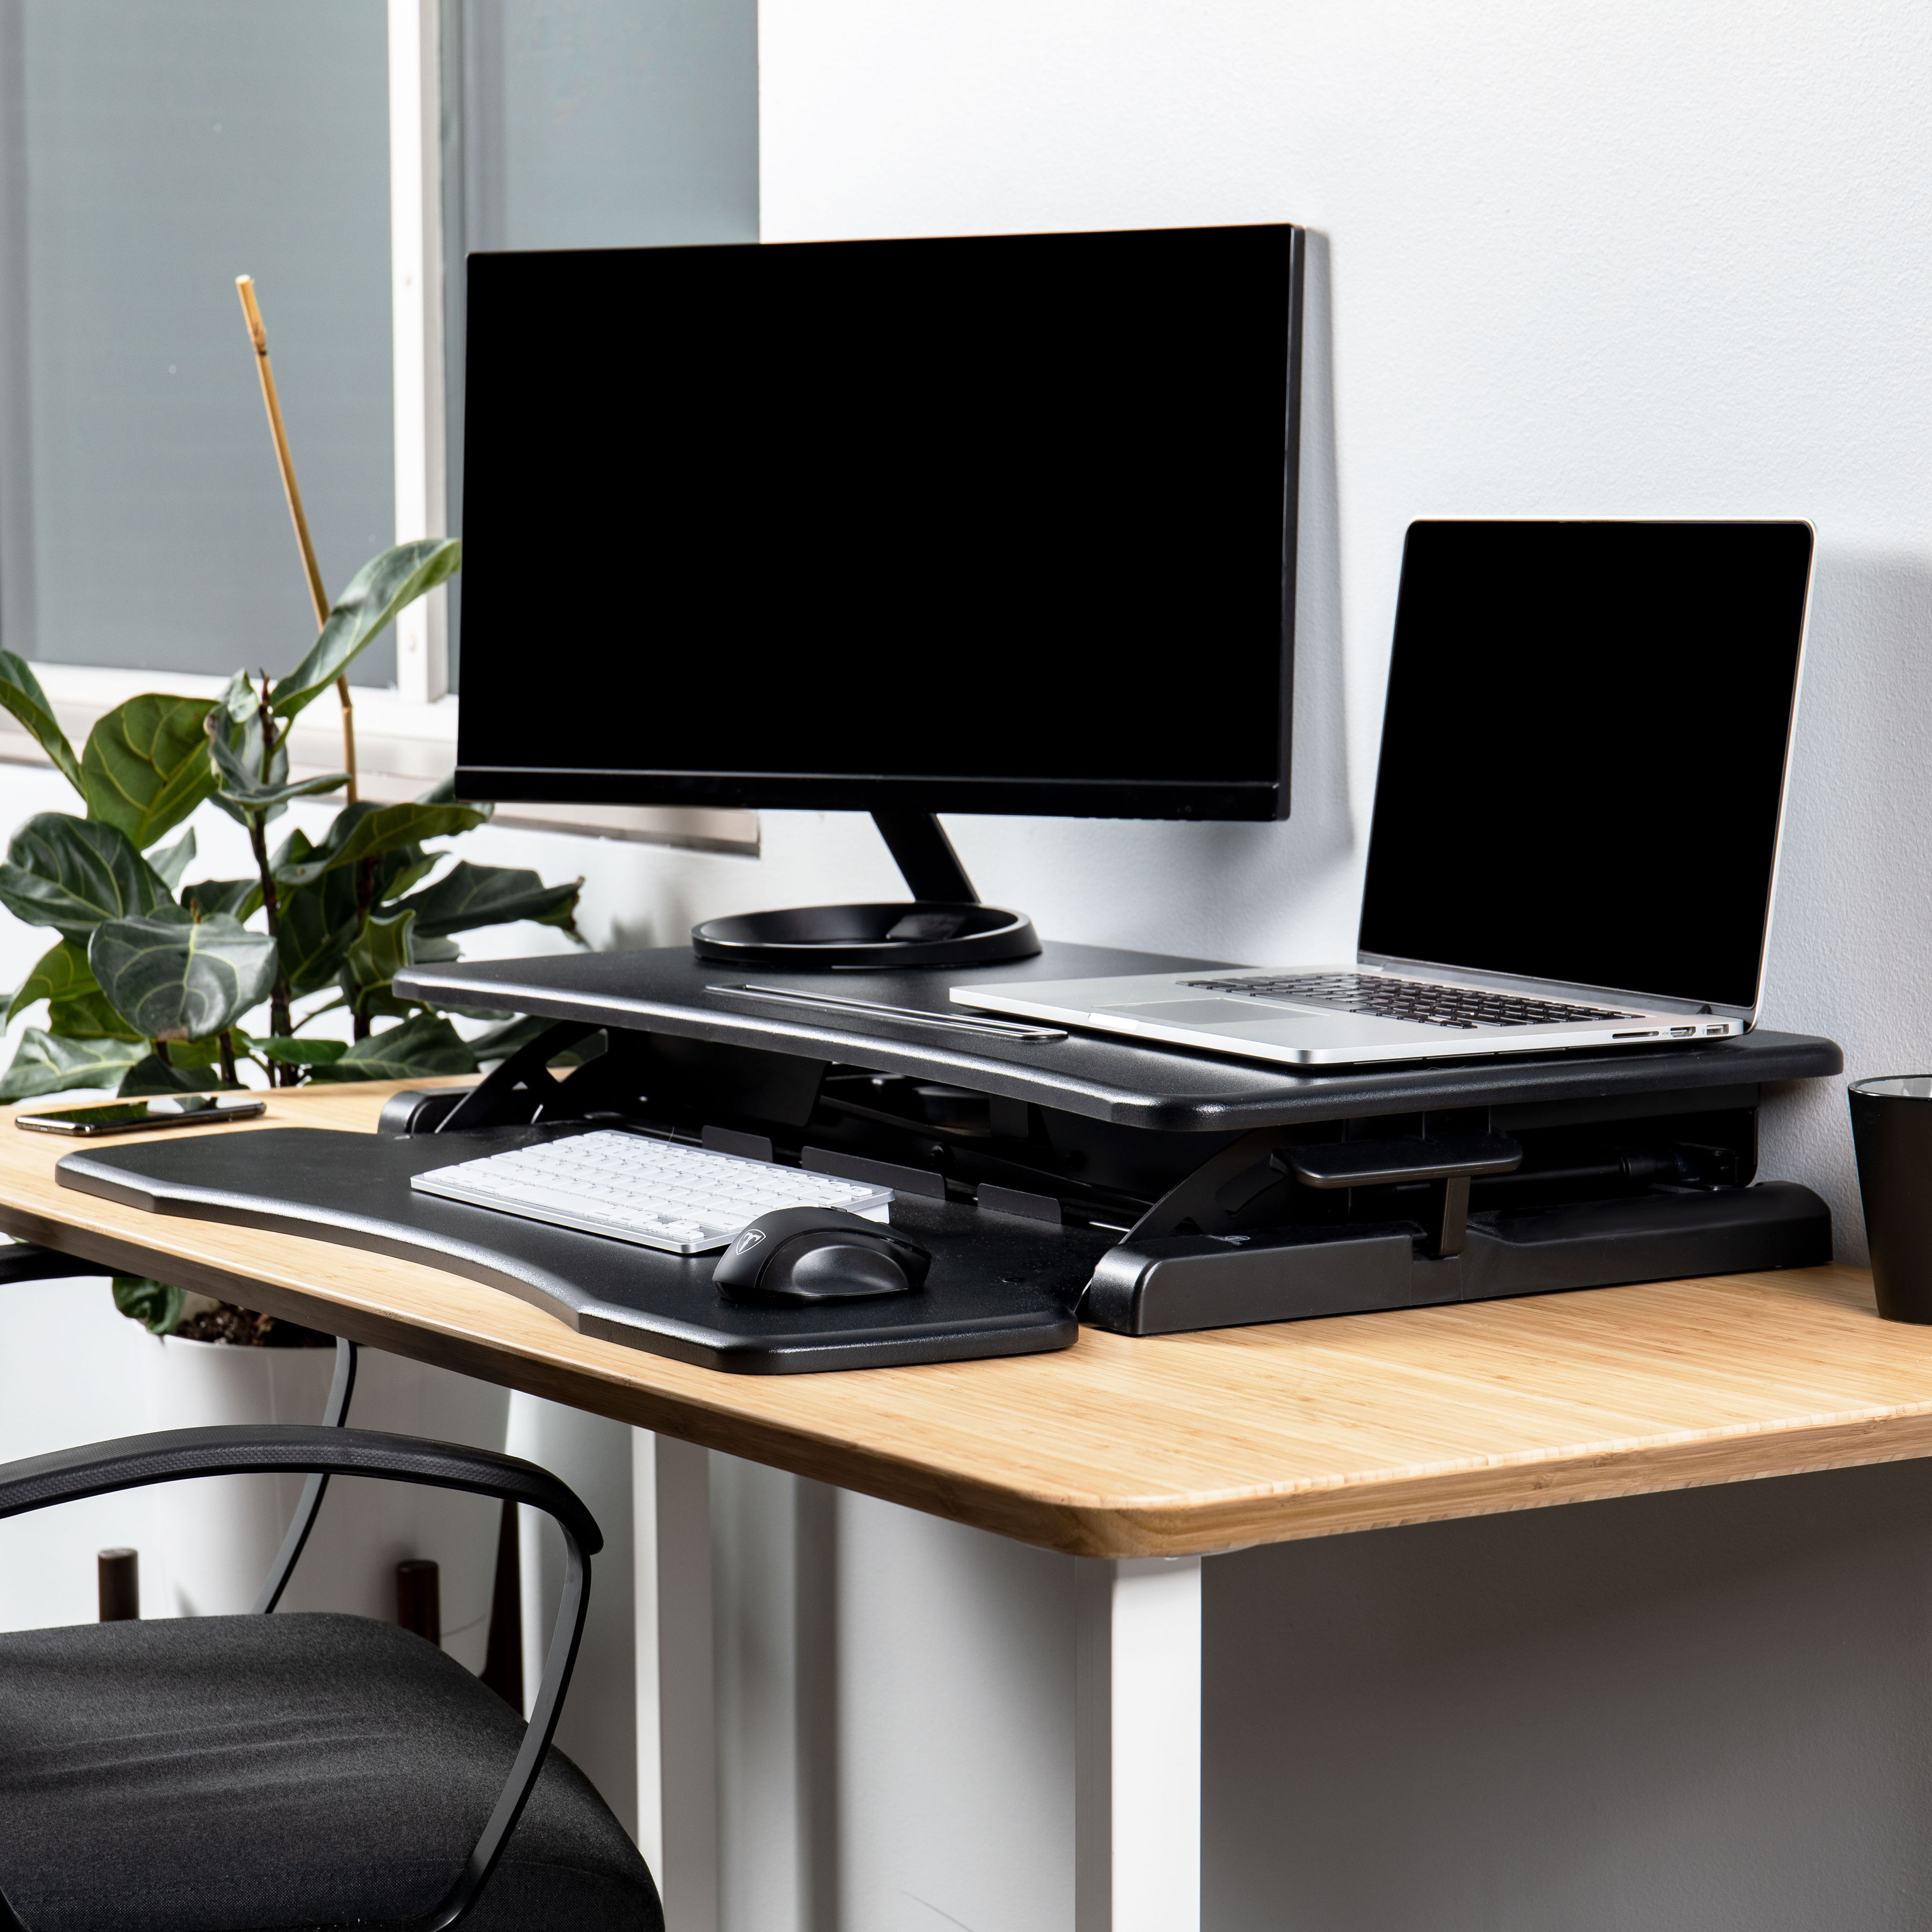 Rise-X-Light-Standing-Desk-Stand-Up-Desk-Height-Adjustable-Desk-Converter thumbnail 12